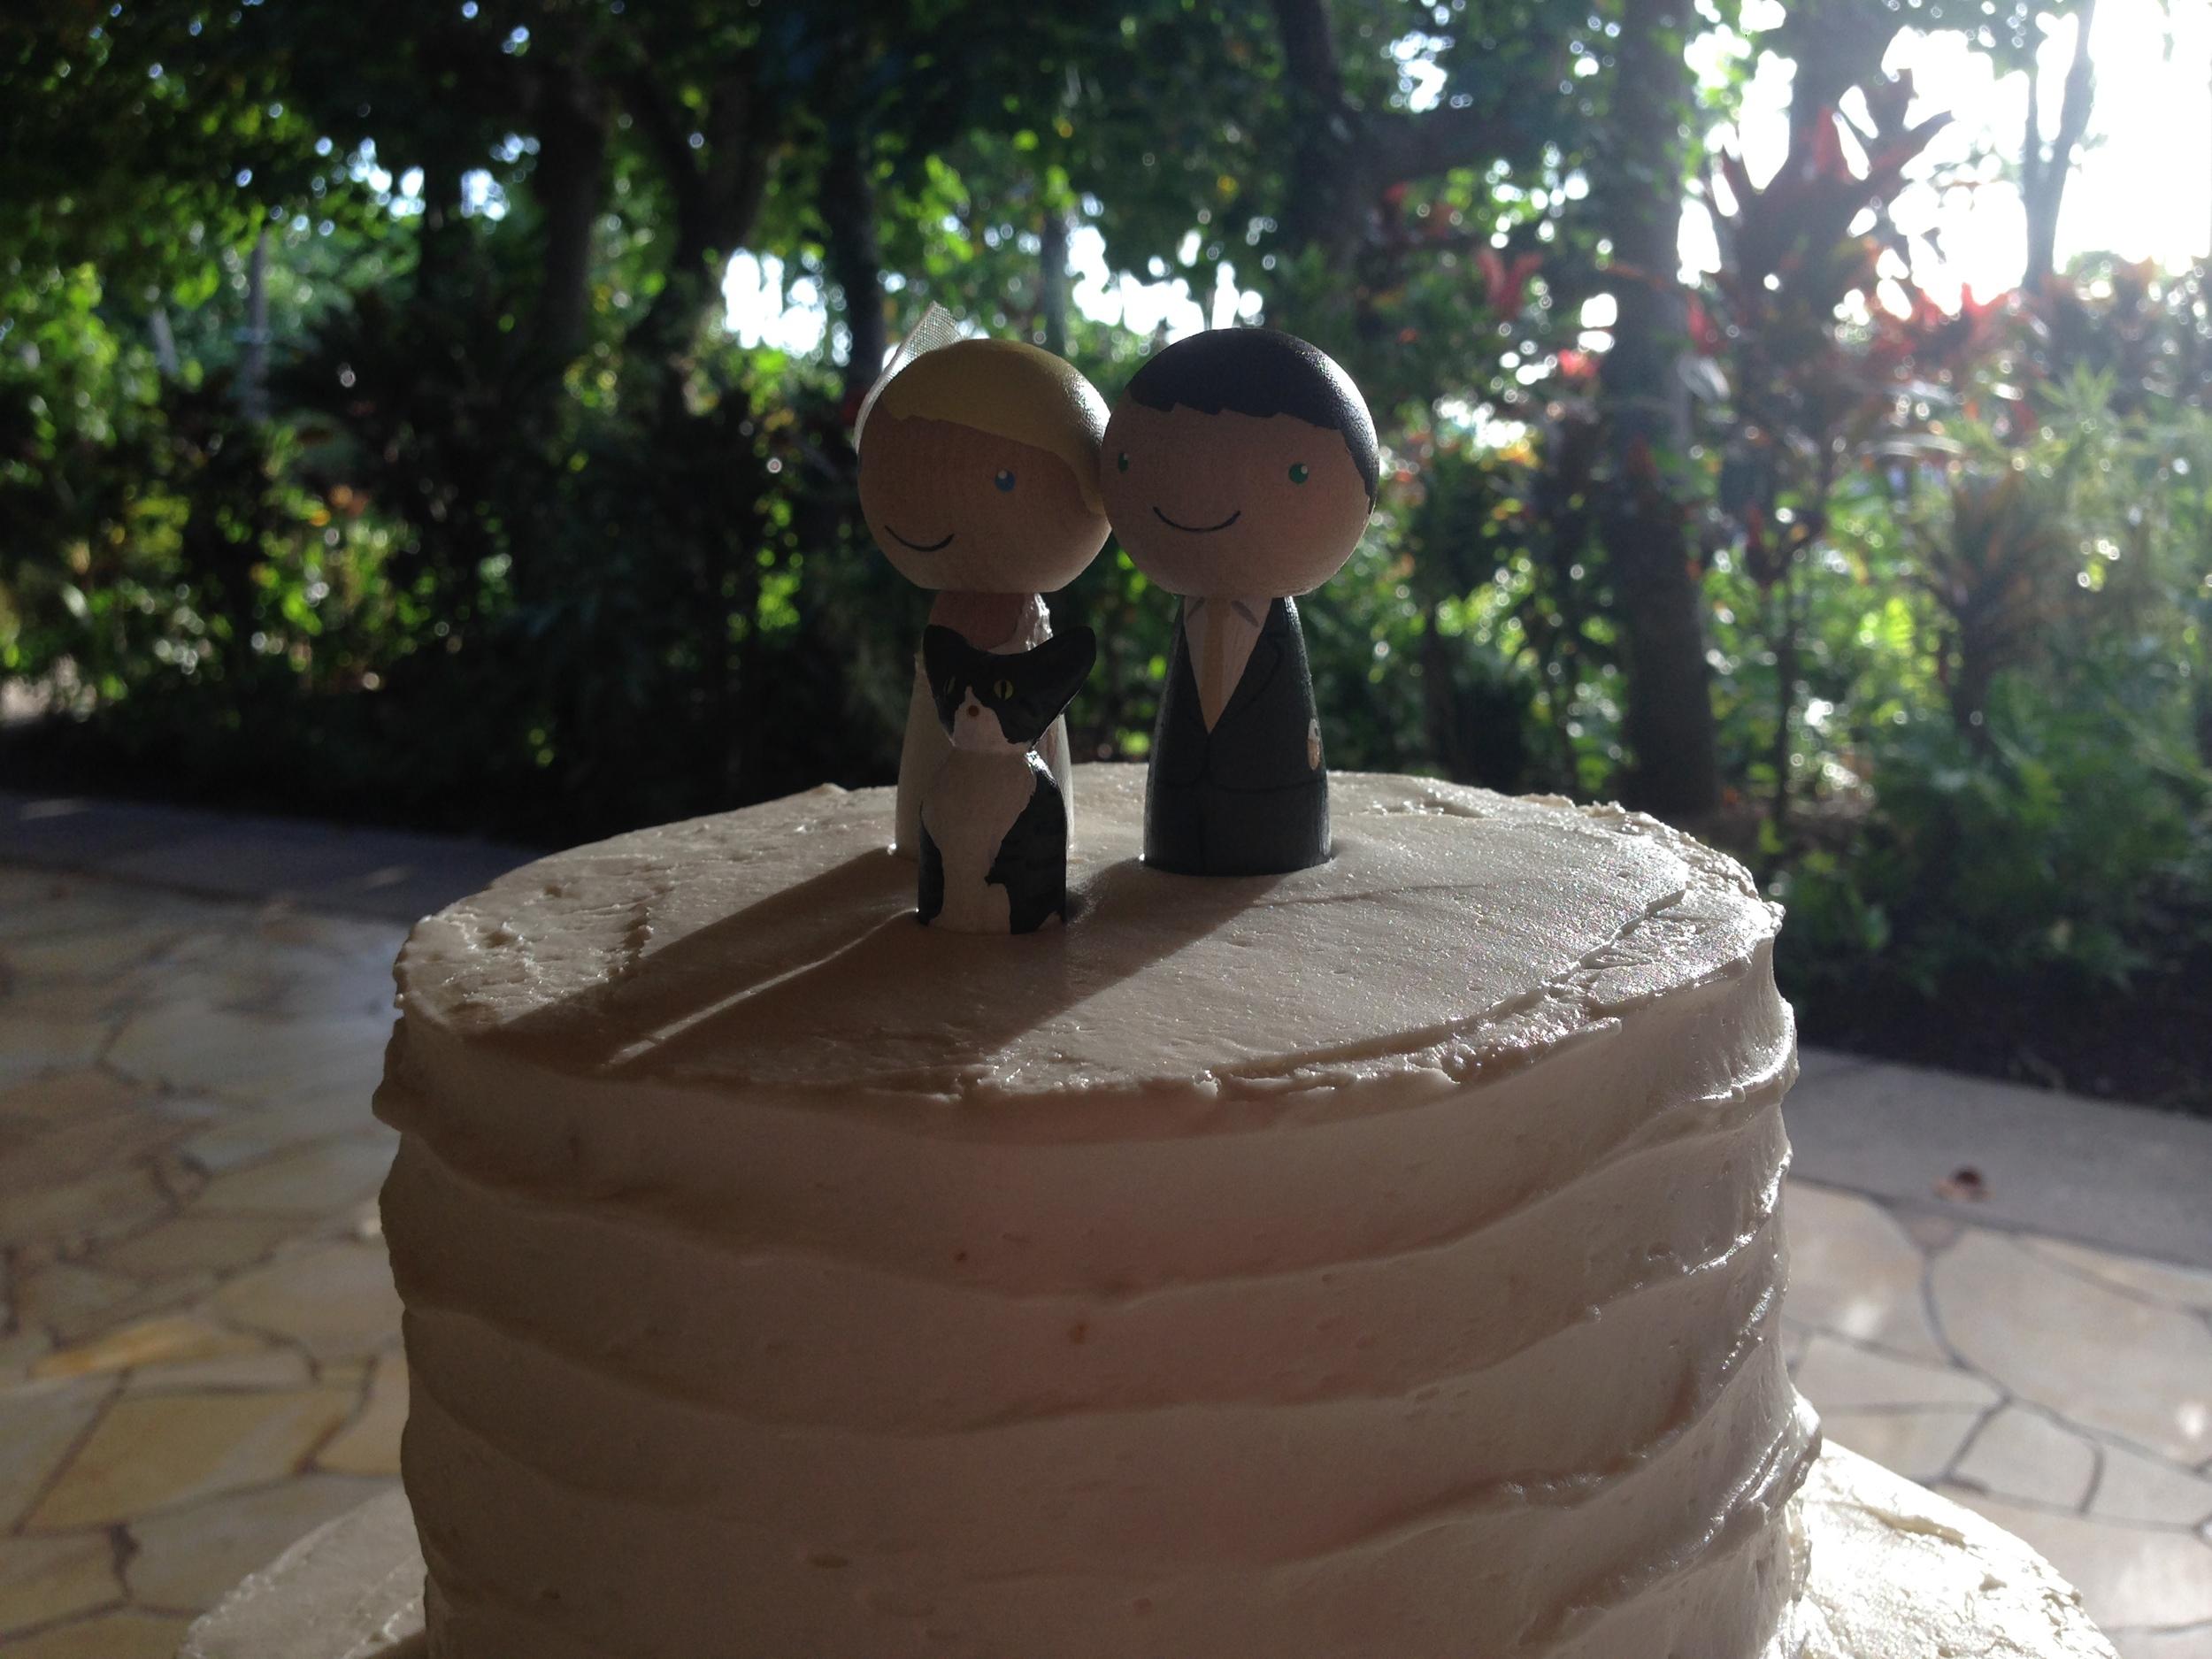 13-wedding-cake-customized-cake-topper.JPG